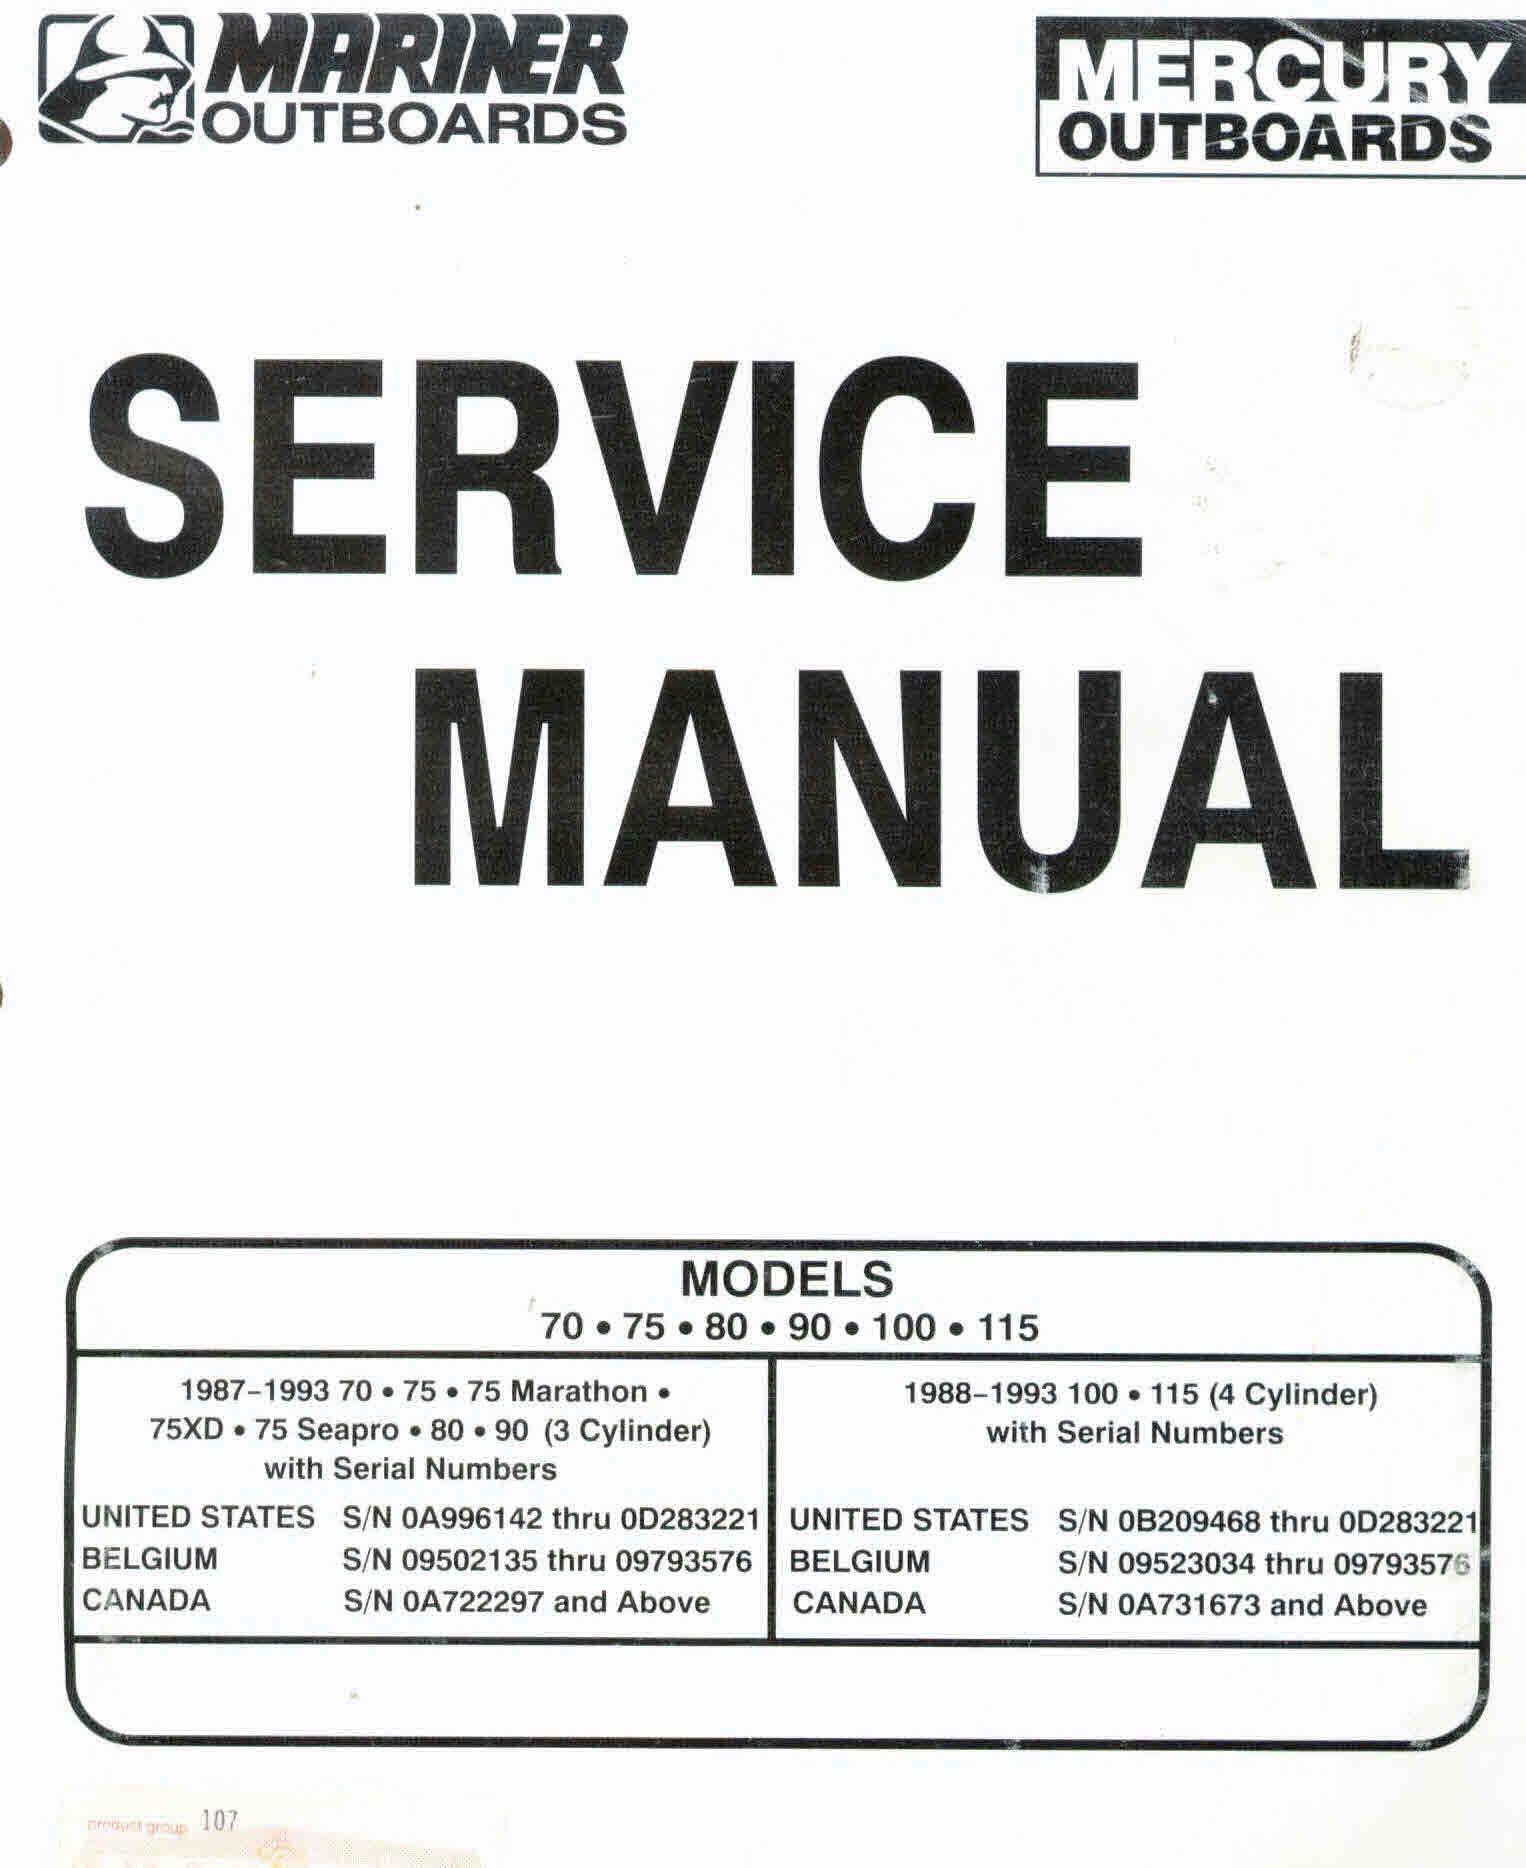 Honda Gx270 Manual 90 Ebook Arb Air Compressor Wiring Diagram Http Forumih8mudcom 60series Array 1988 Mariner Hp Service Rh